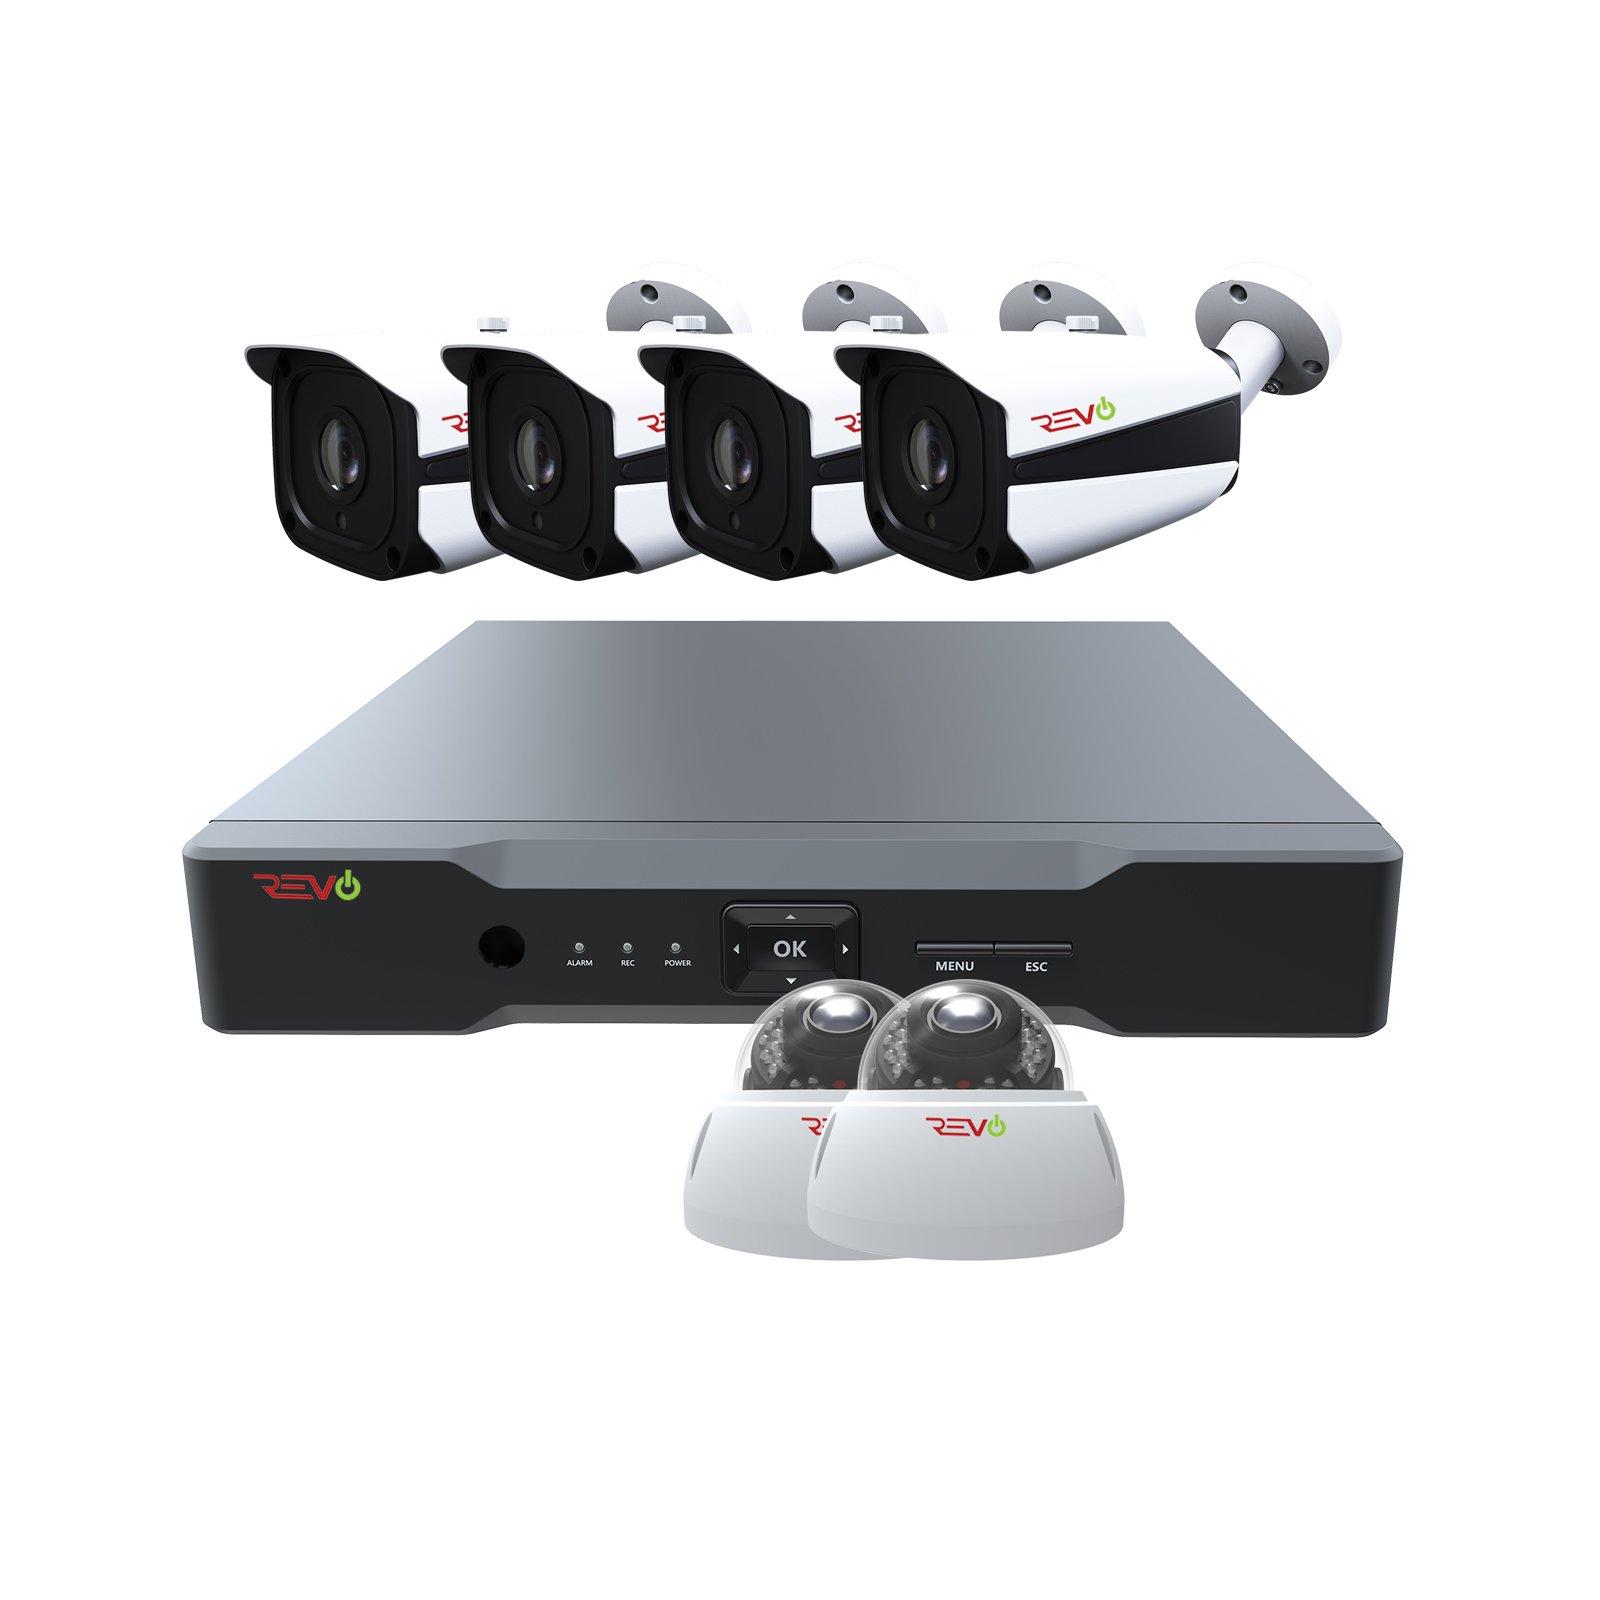 Revo America AeroHD 8Ch. 5MP DVR, 2TB HDD Video Security System, 4 x 5 MP IR Bullet Cameras, 2 x 5 MP IR Vandal Dome Cameras Indoor/Outdoor - Remote Access via Smart Phone, Tablet, PC & MAC